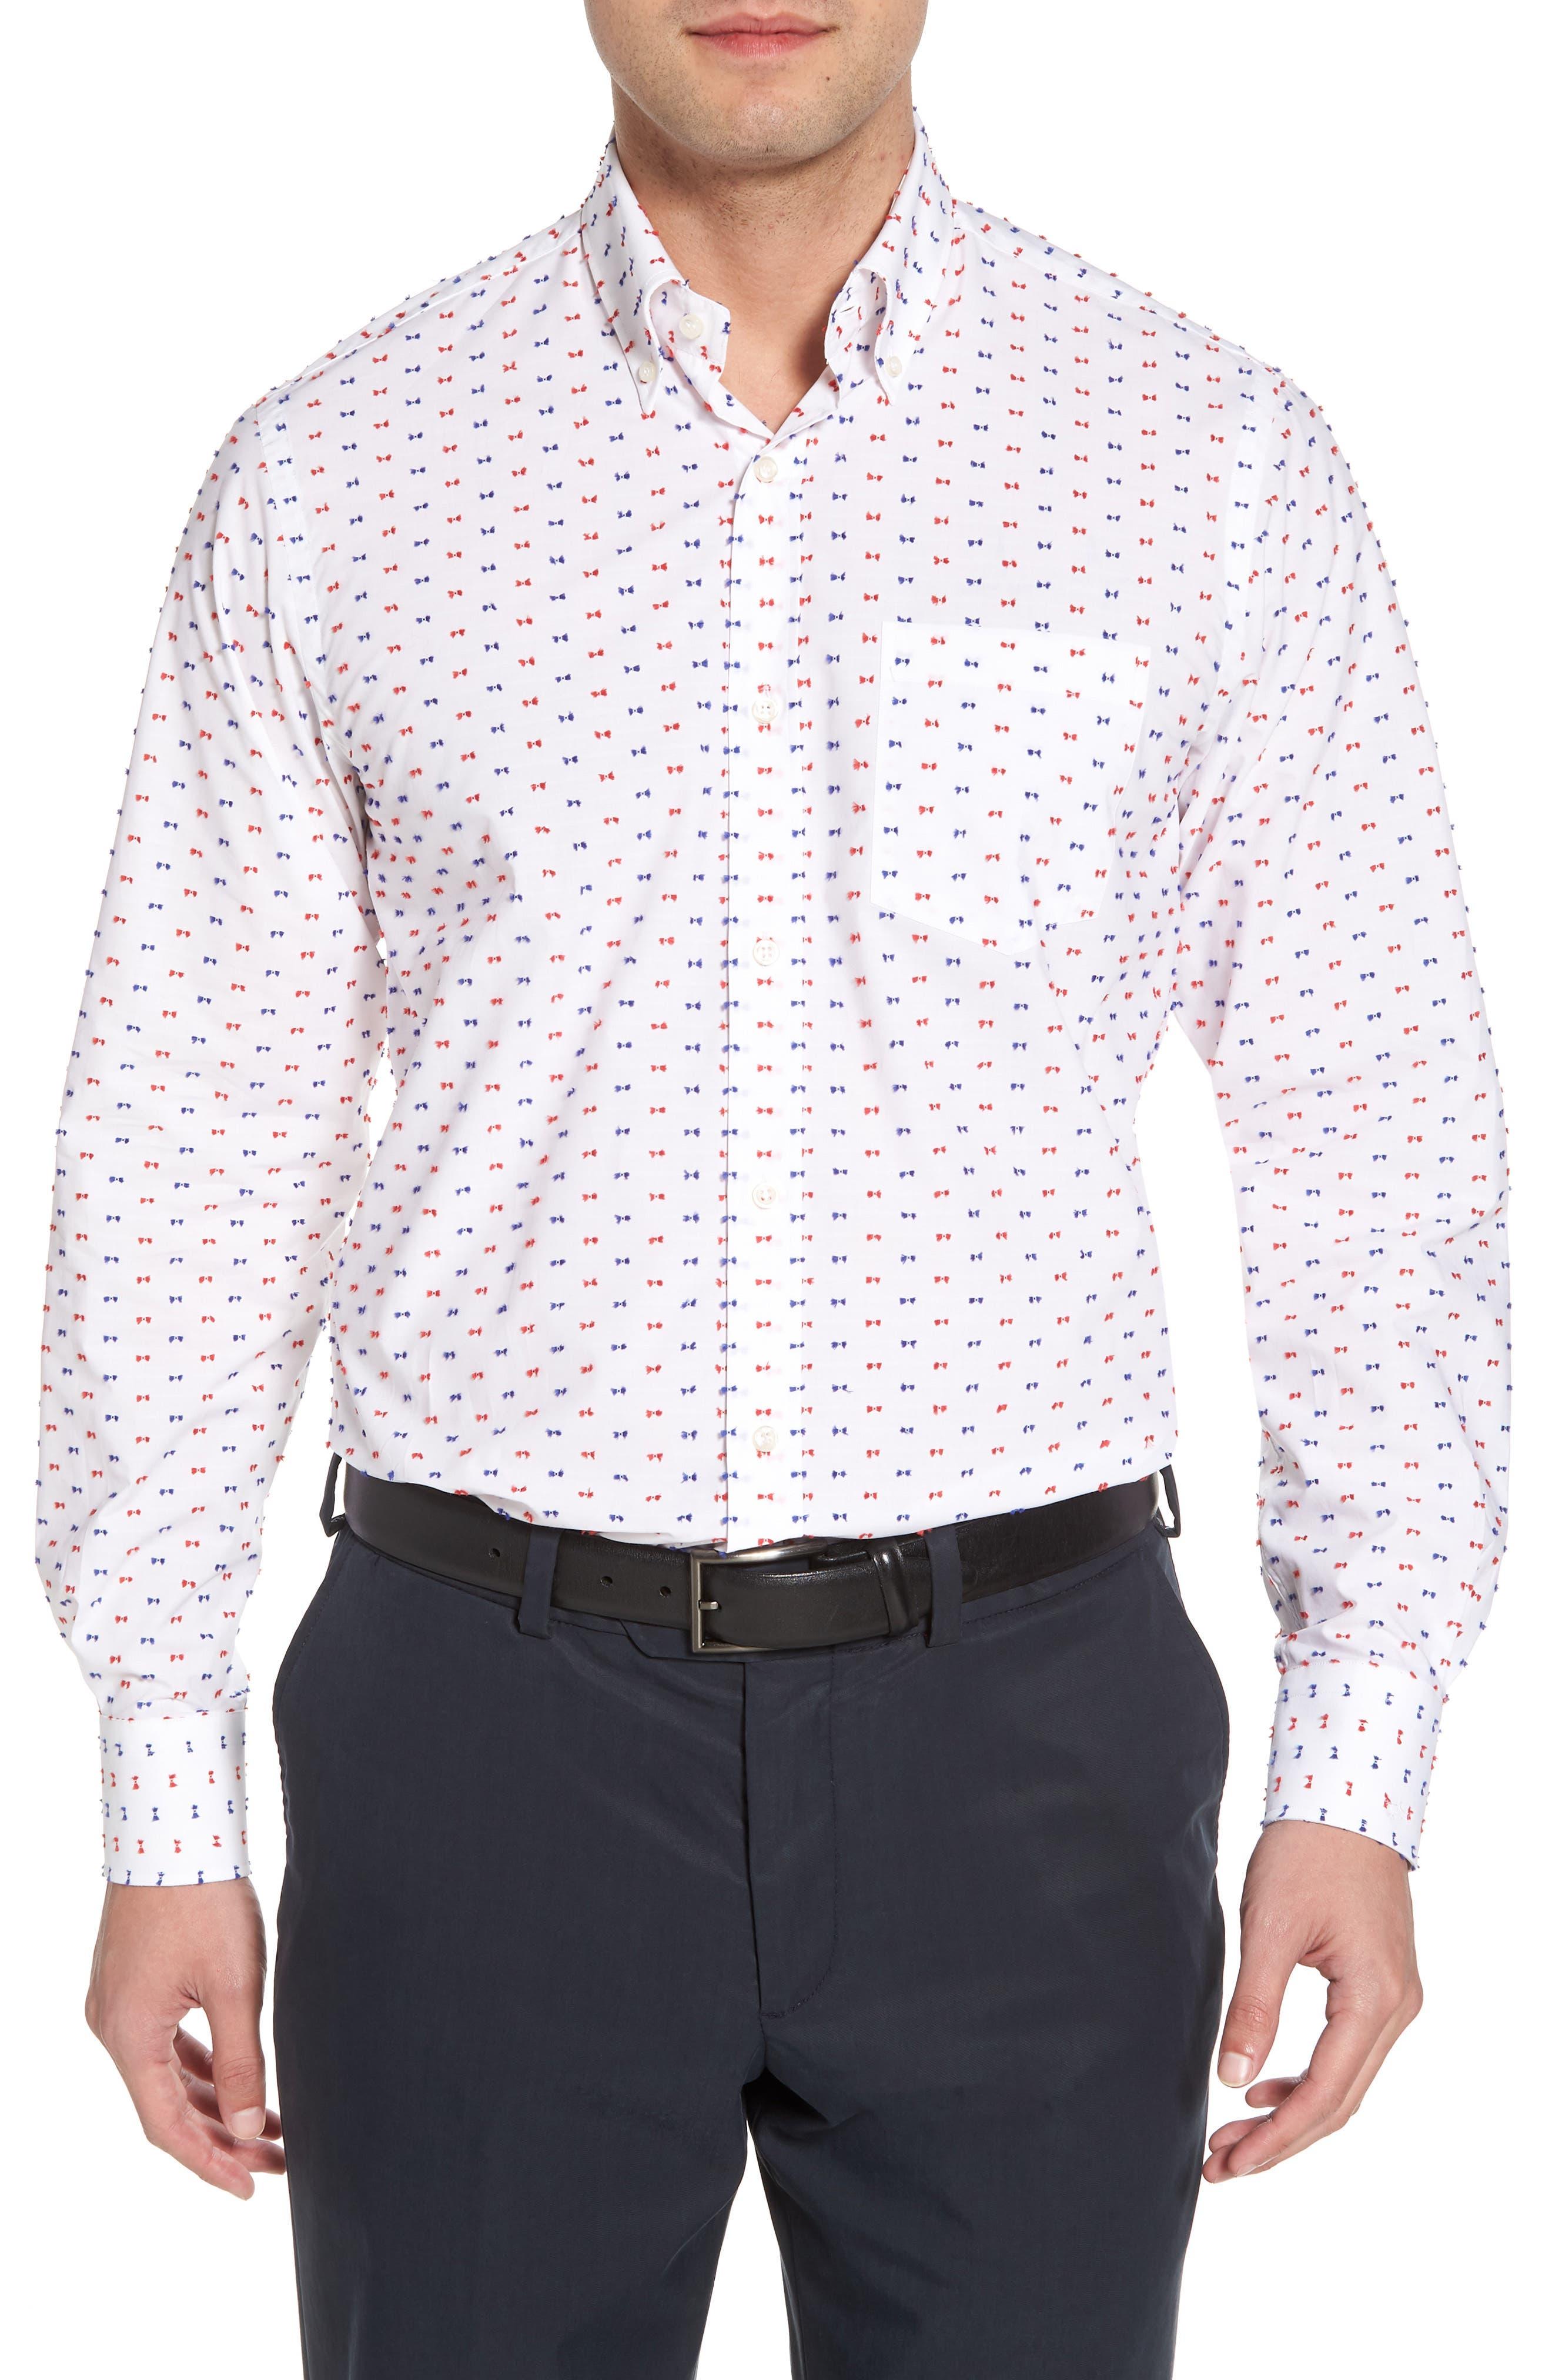 Paul&Shark Regular Fit Feathered Sport Shirt,                             Main thumbnail 1, color,                             White